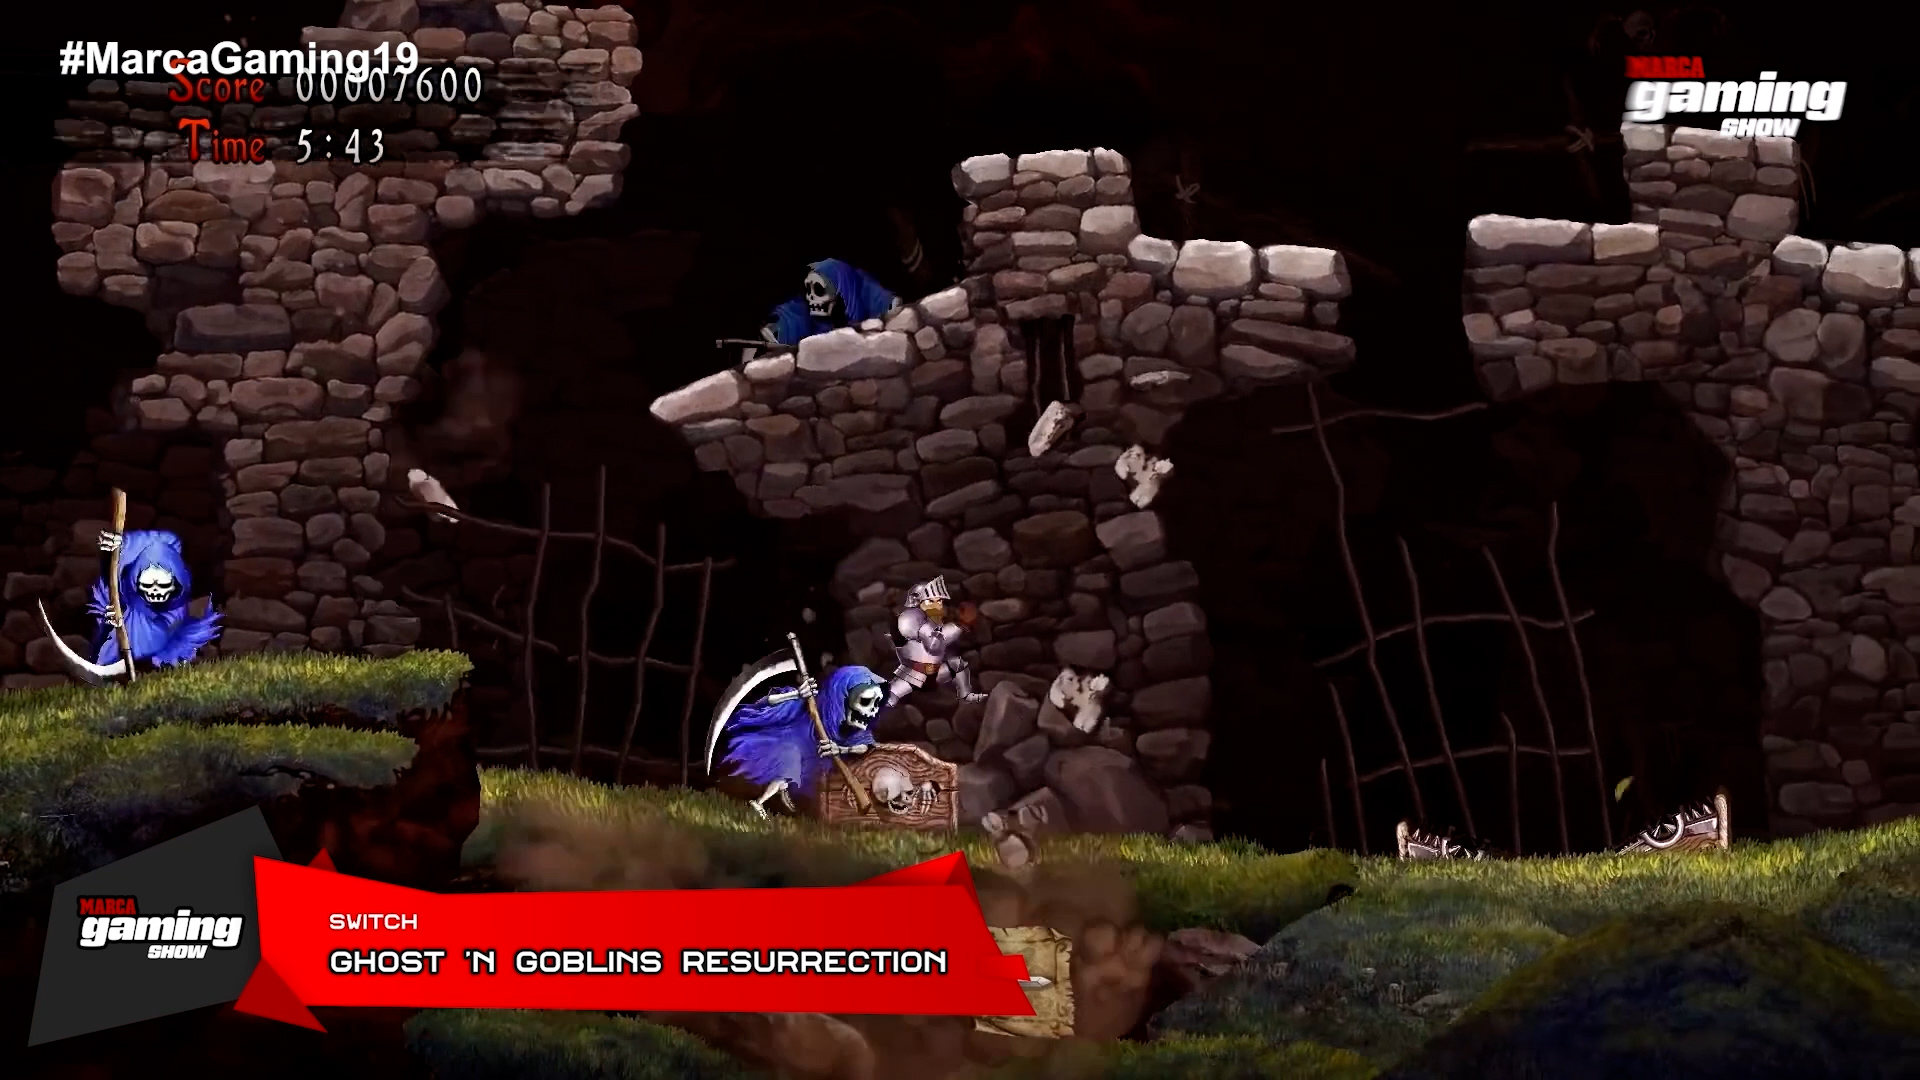 Ghost'n Goblins Resurrection (SWITCH)